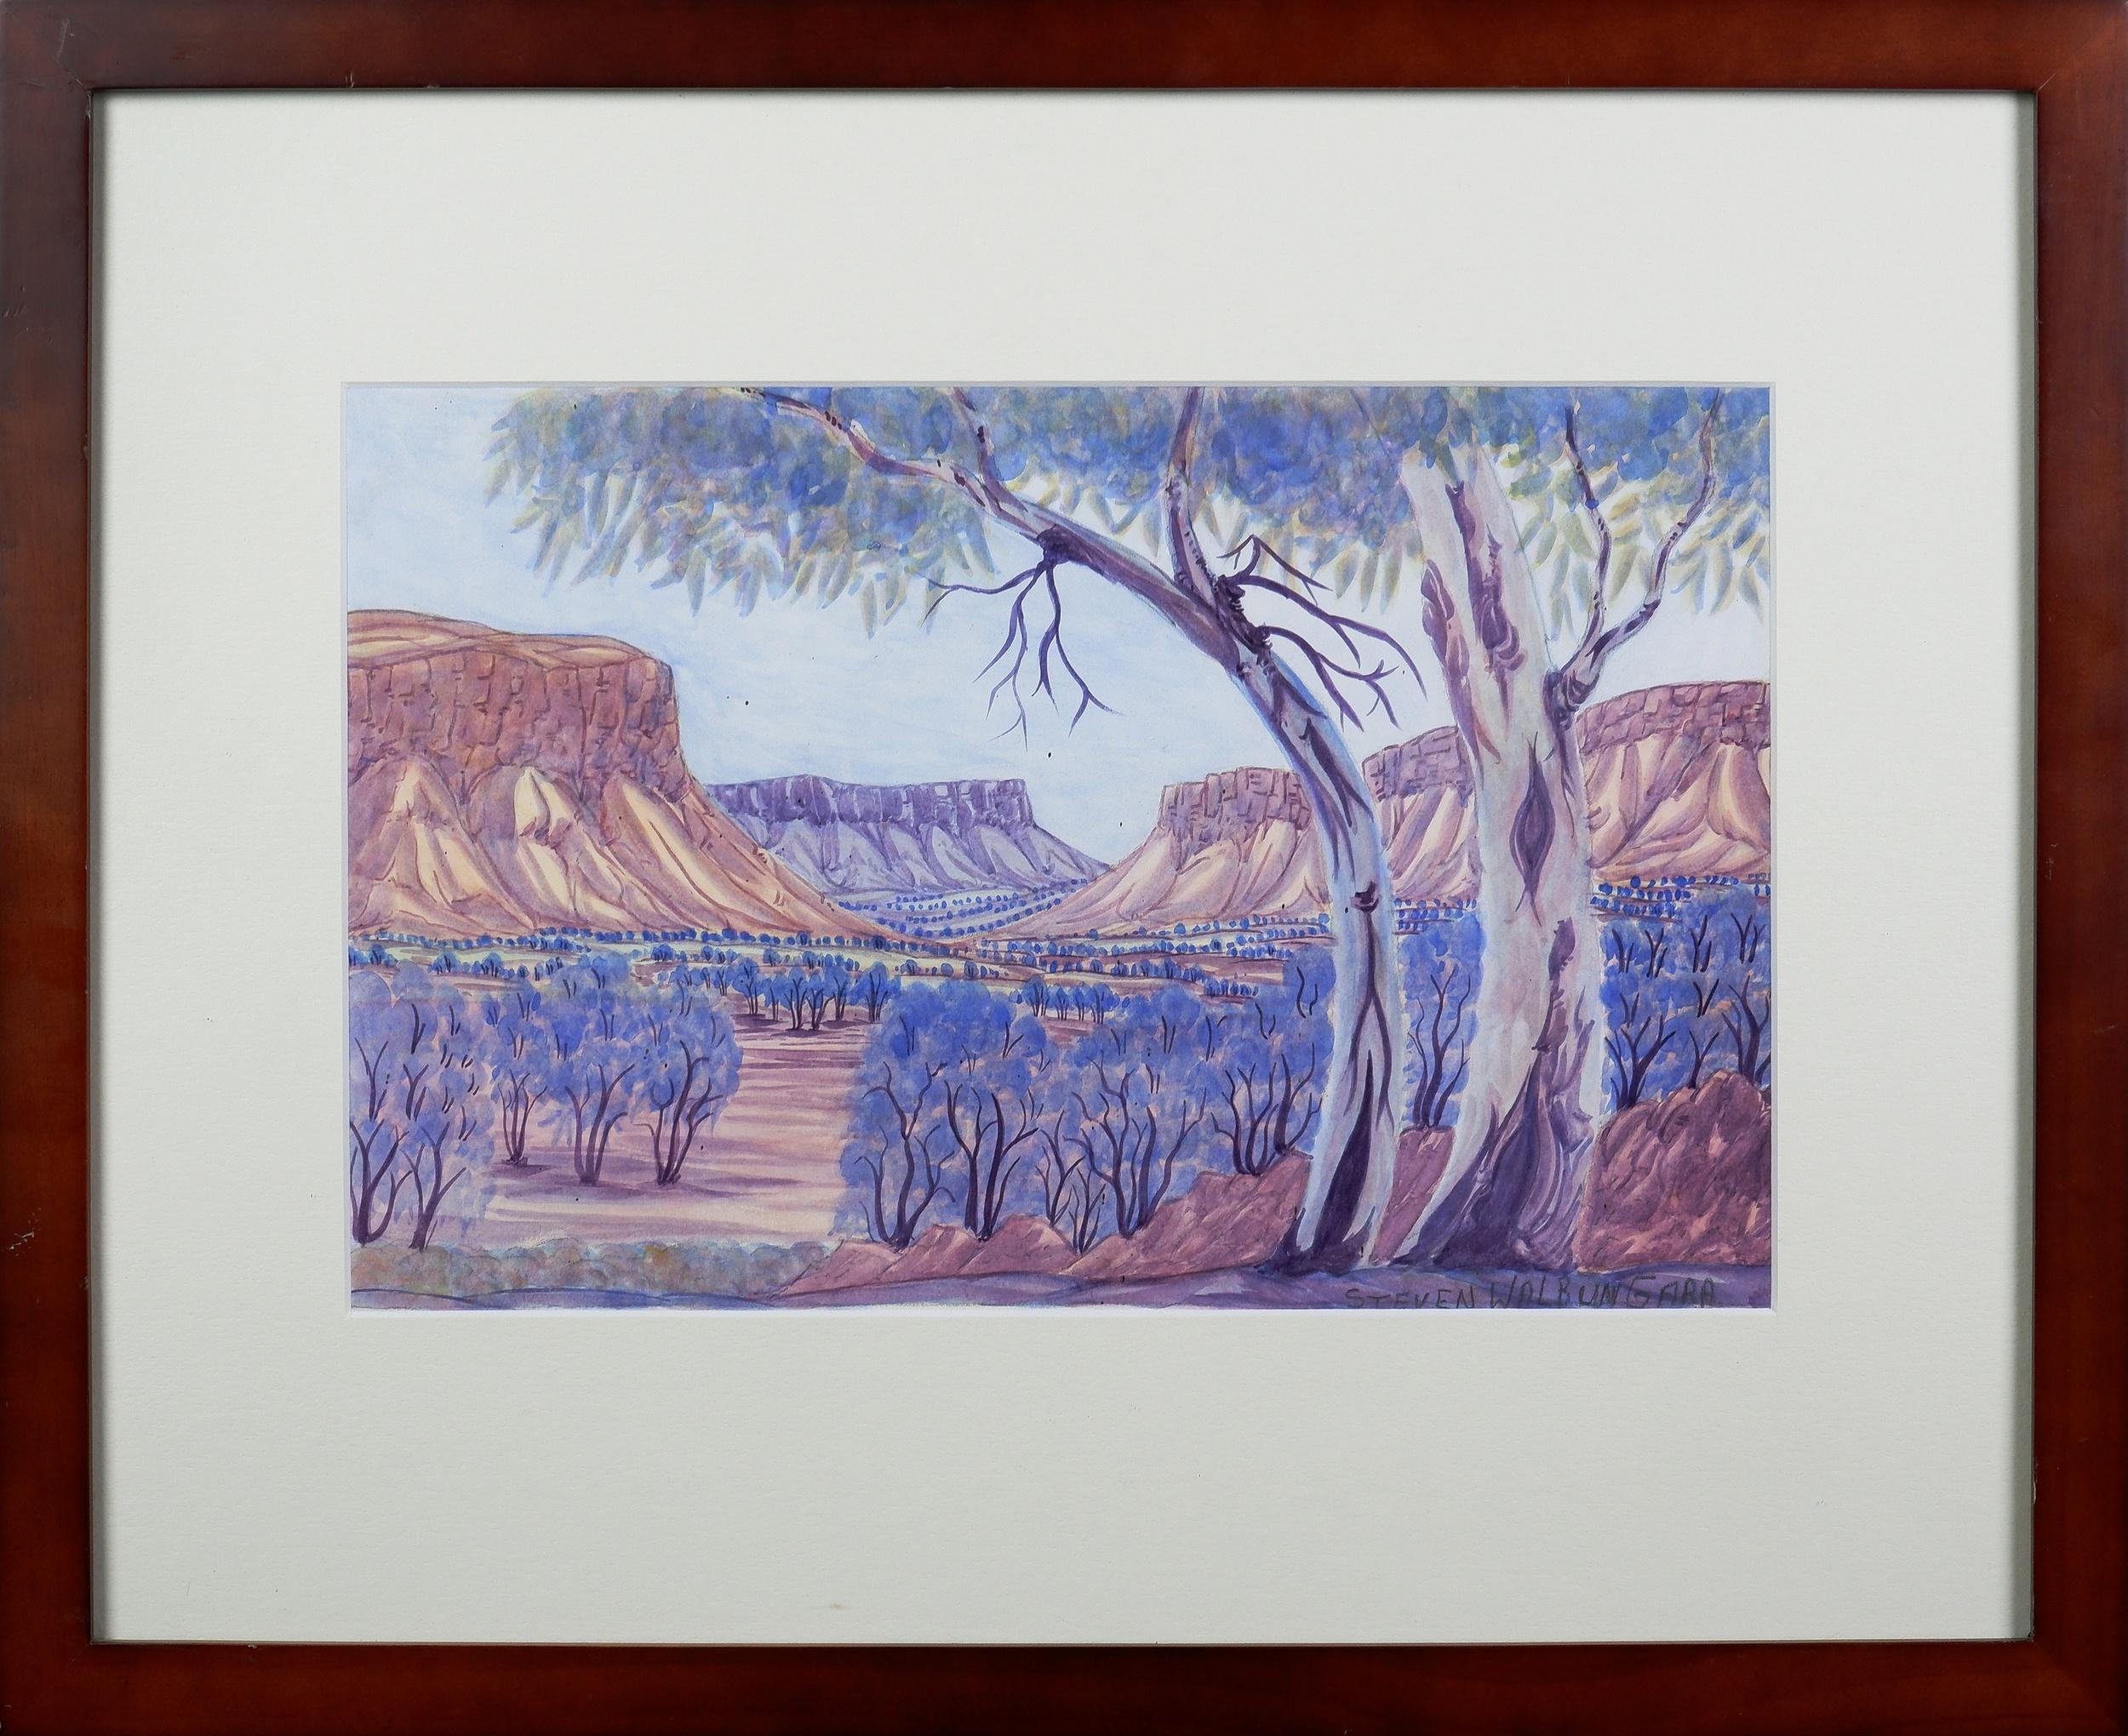 'Steven Walbungara (born 1959), Ormiston Gorge, Watercolour, 24 x 36 cm'